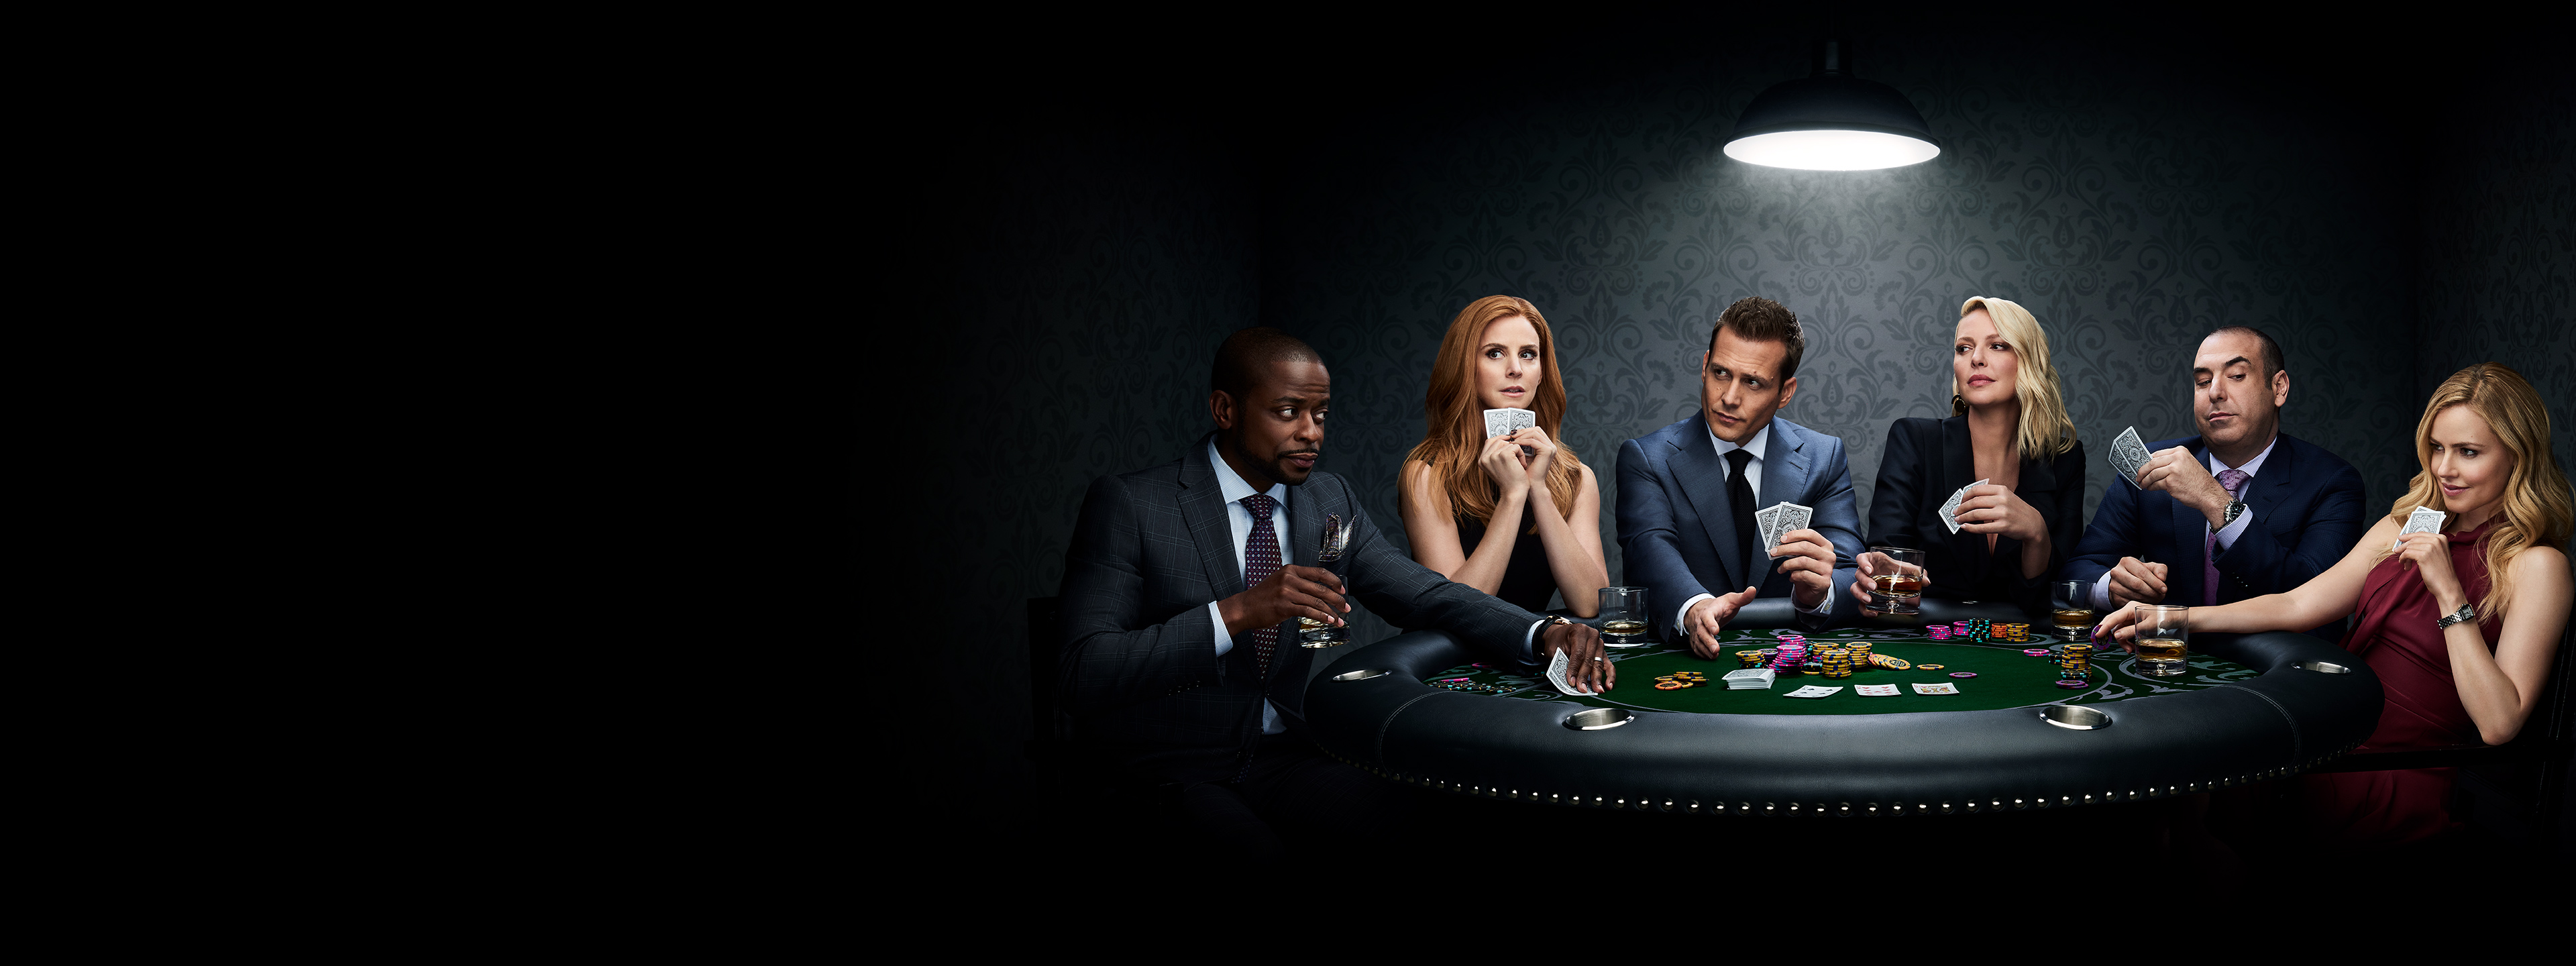 Watch Suits Online   Season 1 - 8 on Lightbox